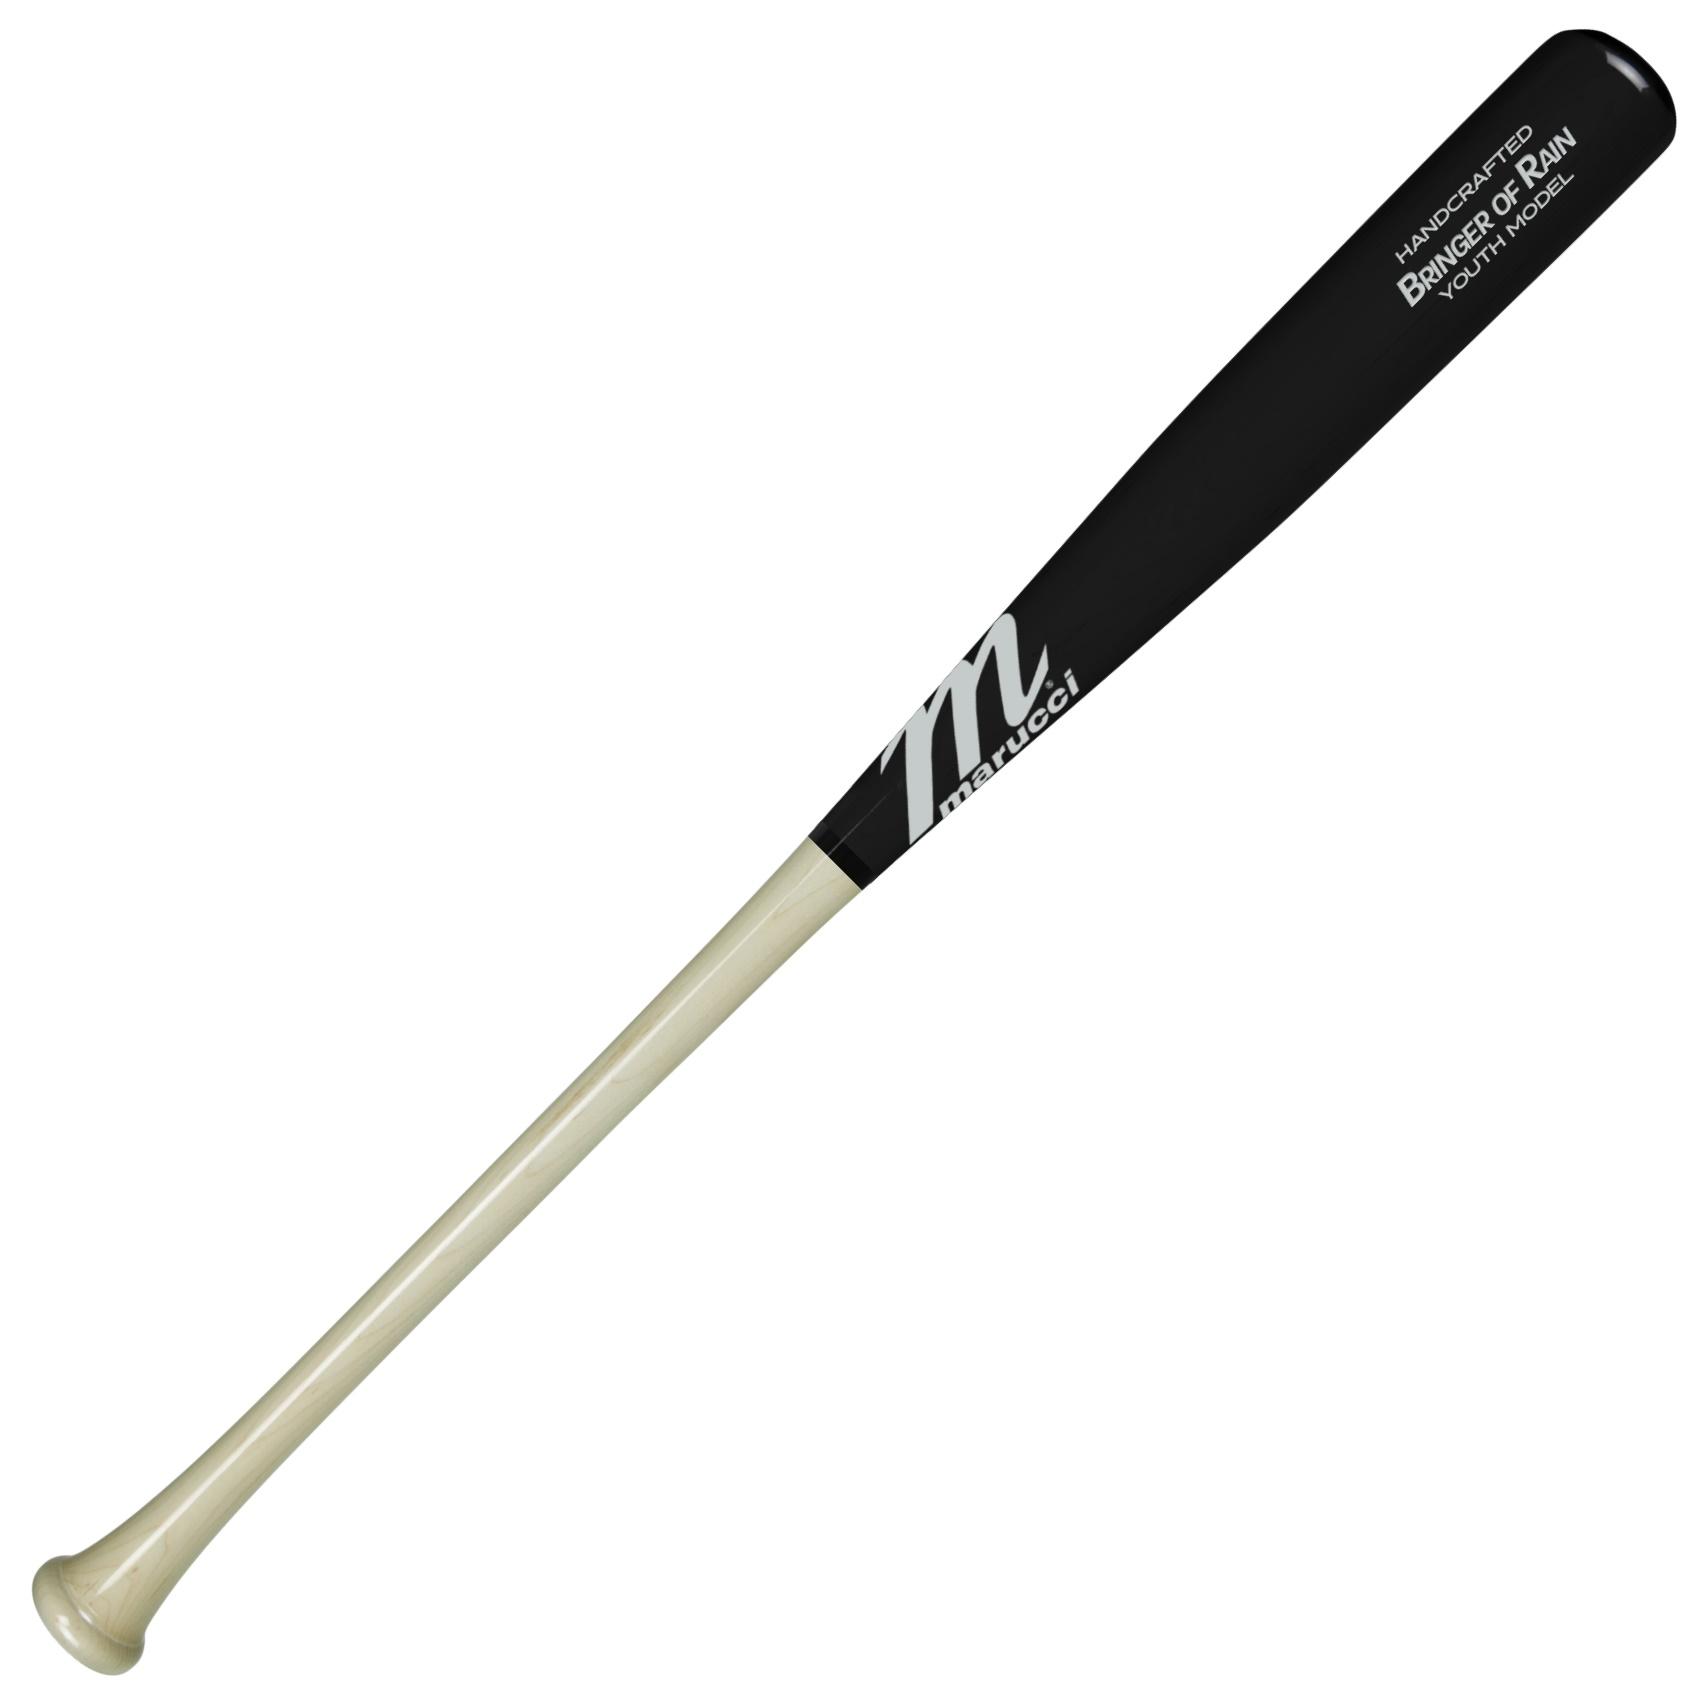 marucci-bringer-of-rain-youth-maple-wood-baseball-bat-28-inch MYVE2BOR-NBK-28 Marucci 840058700800 <h1 class=productView-title-lower>YOUTH JOSH DONALDSON BRINGER OF RAIN PRO MODEL</h1> <span>The Bringer